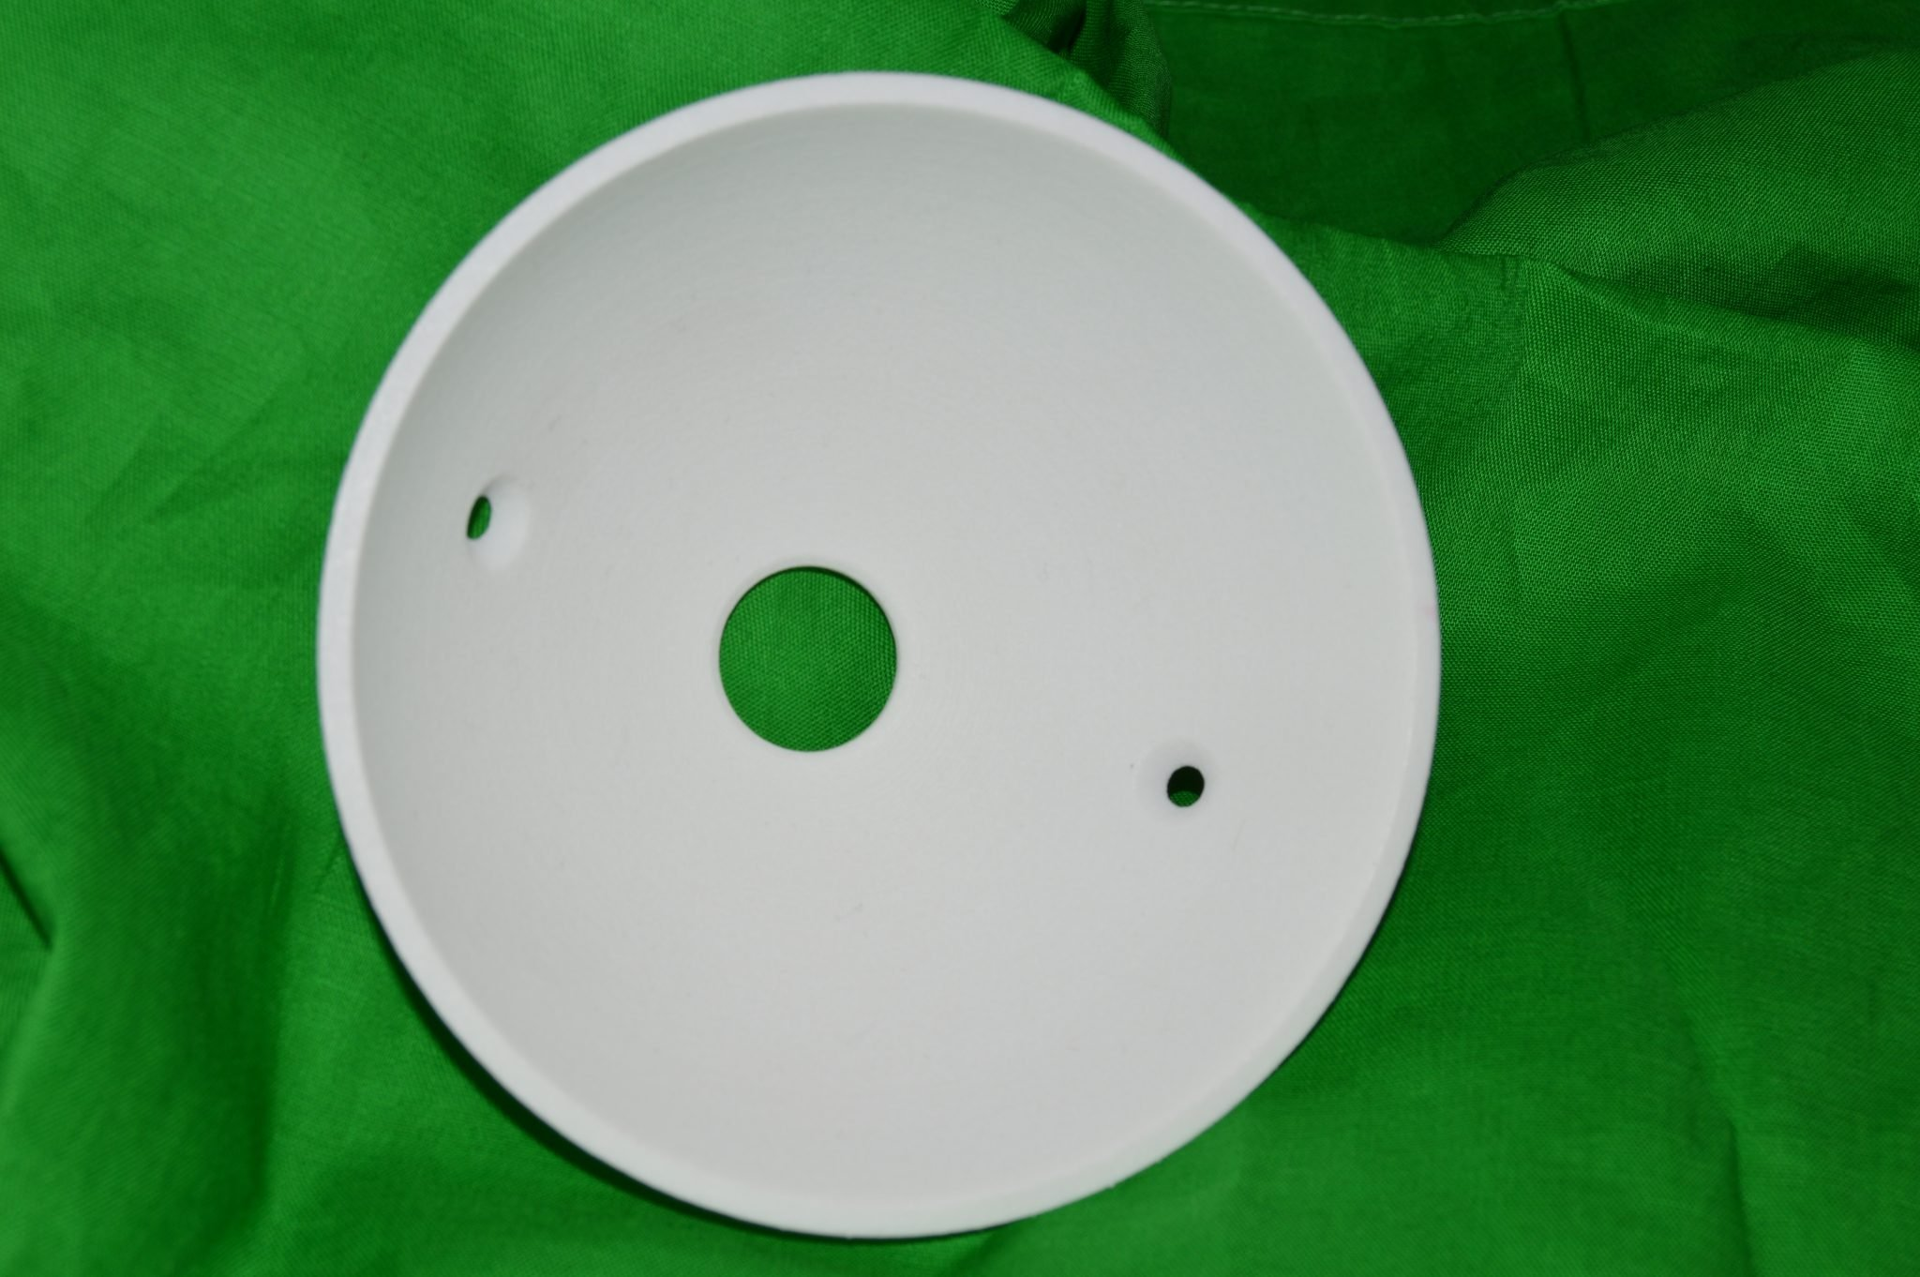 Goldeneye 007 Satellite Dish